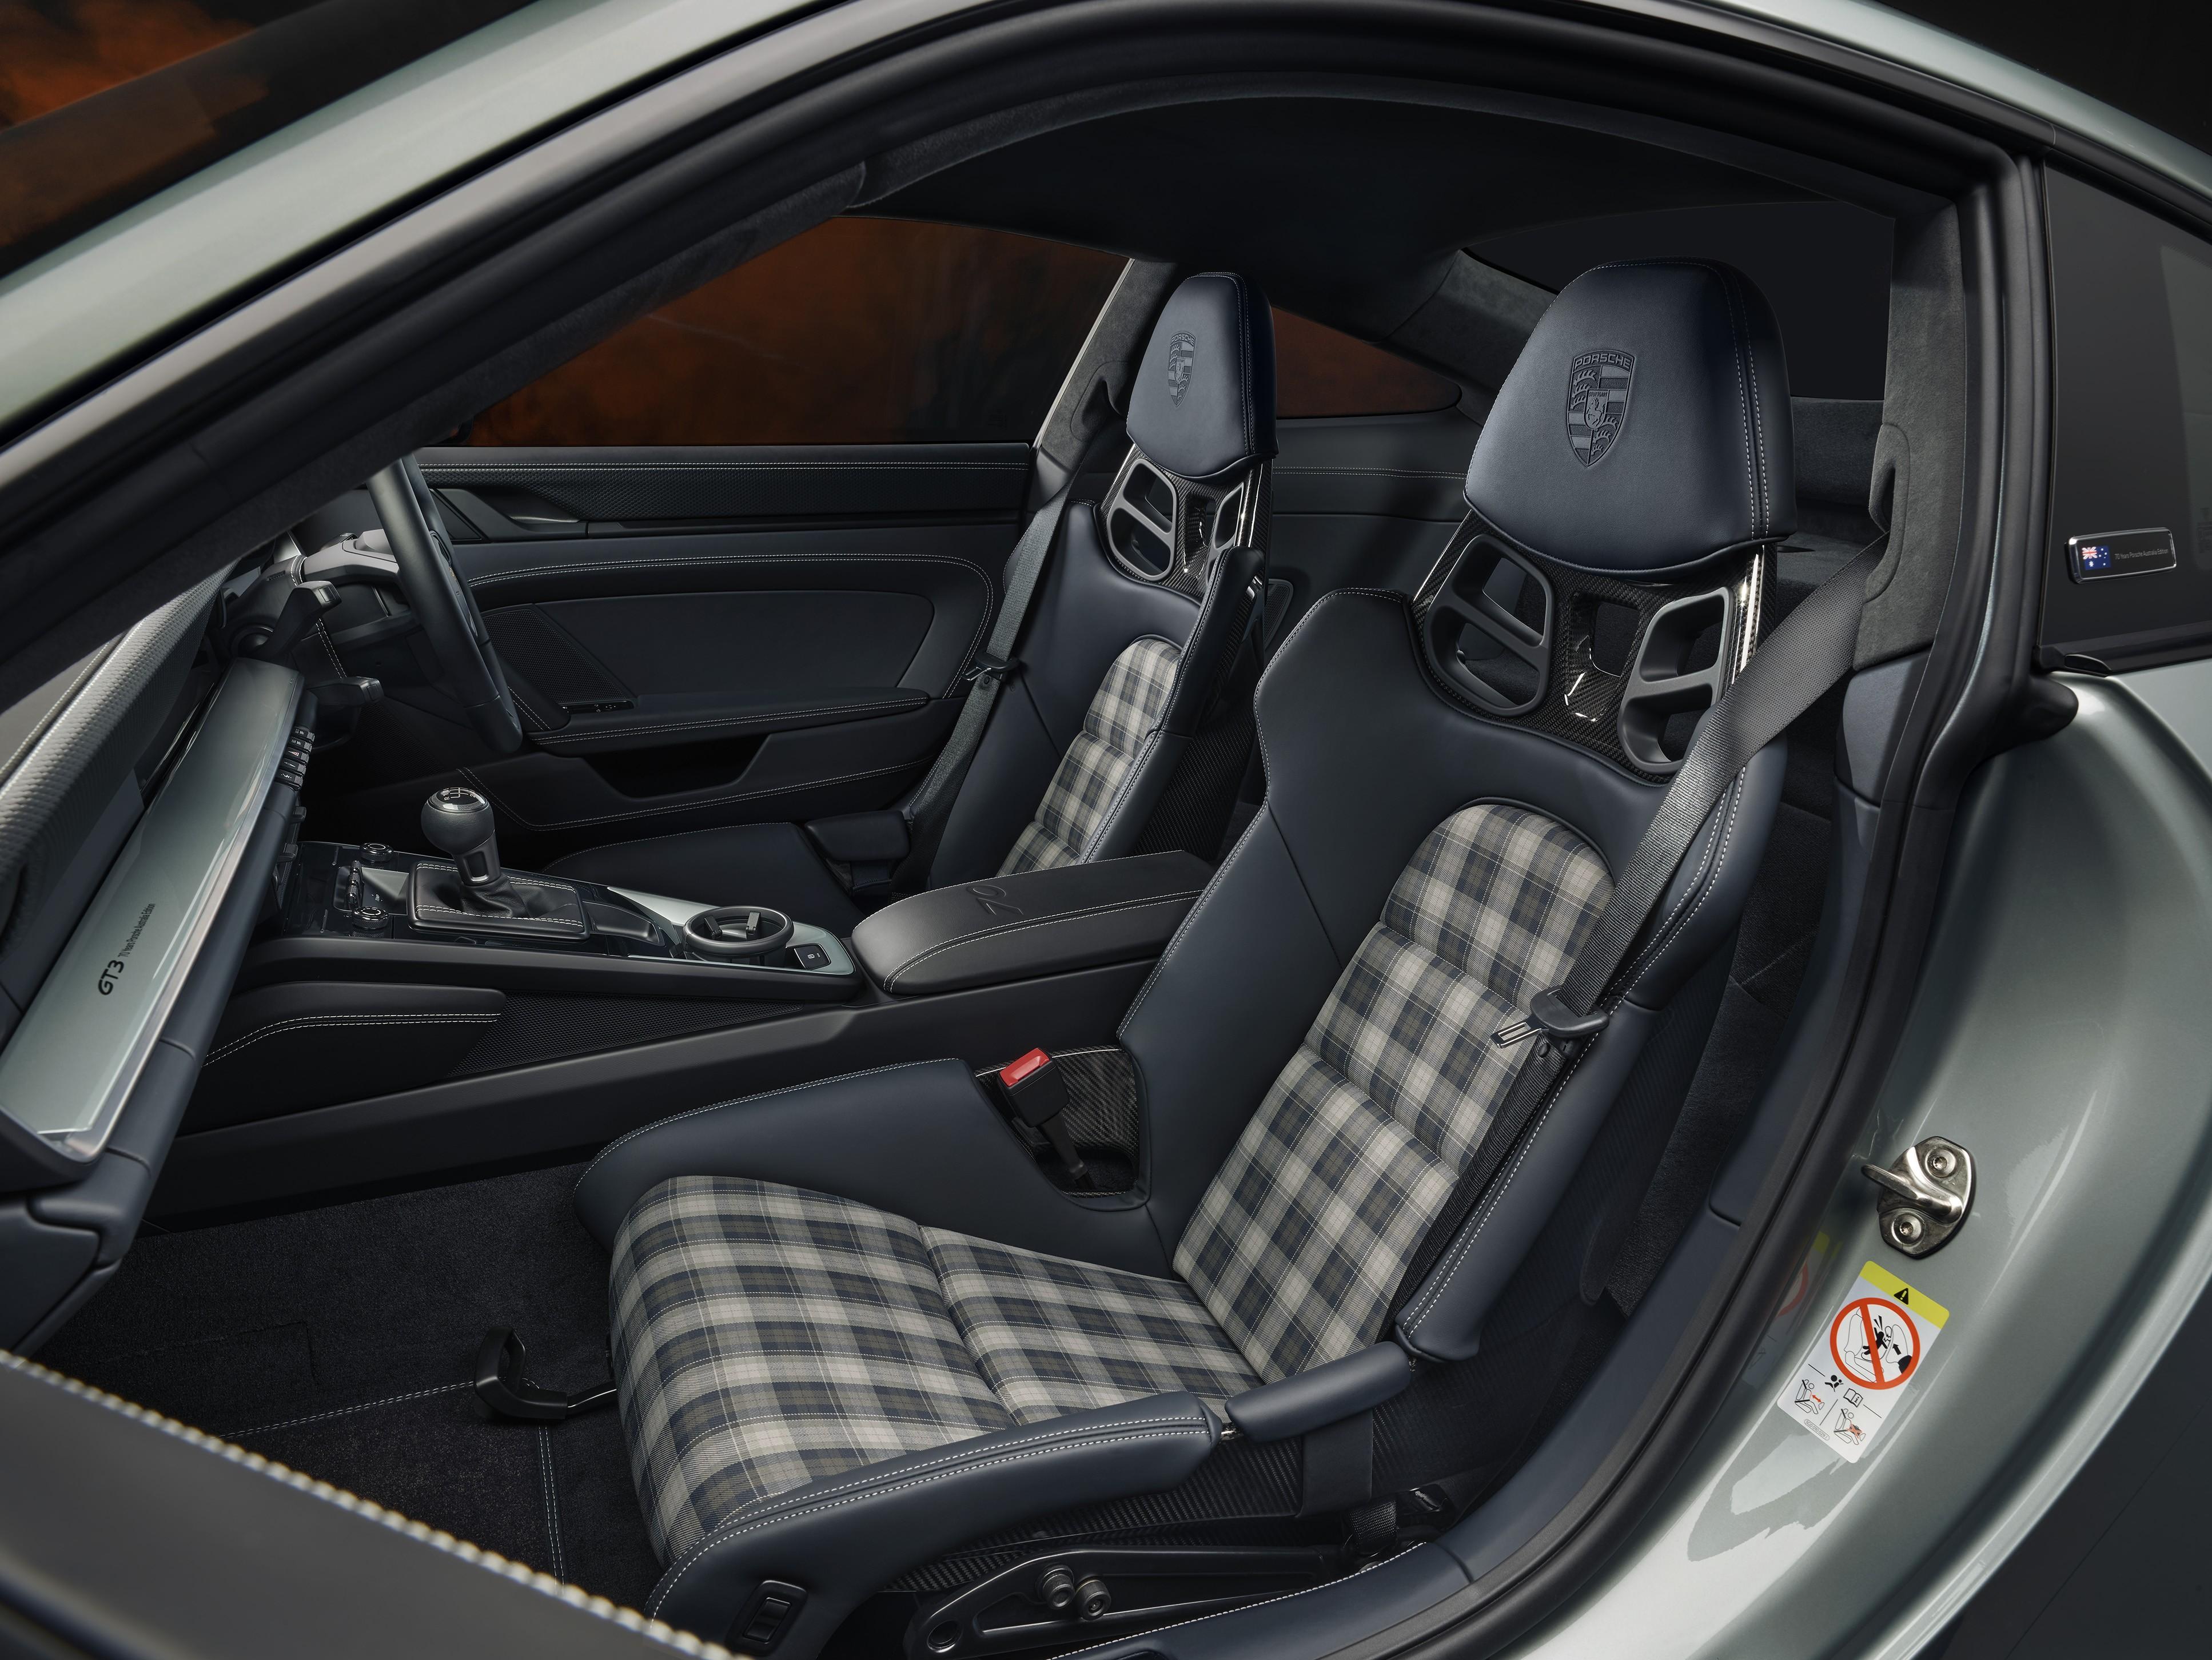 992 GT 3 Touring Australia Interior Edition 2